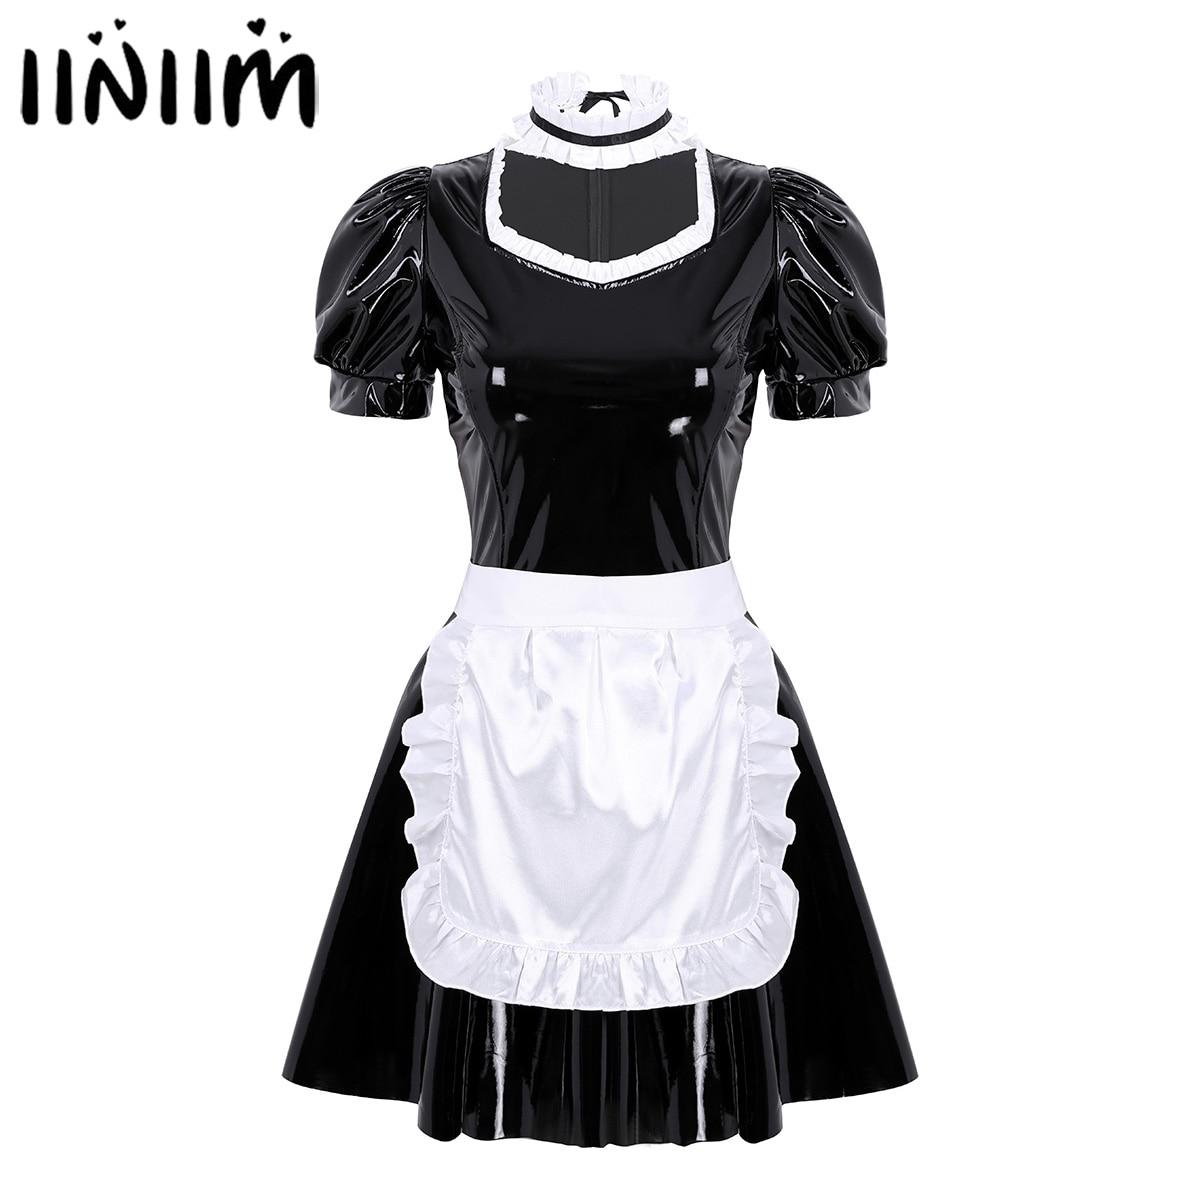 French Maid Dress Apron Cosplay Costume Sexy Clubwear Adults Women with Headband Puff-Sleeve